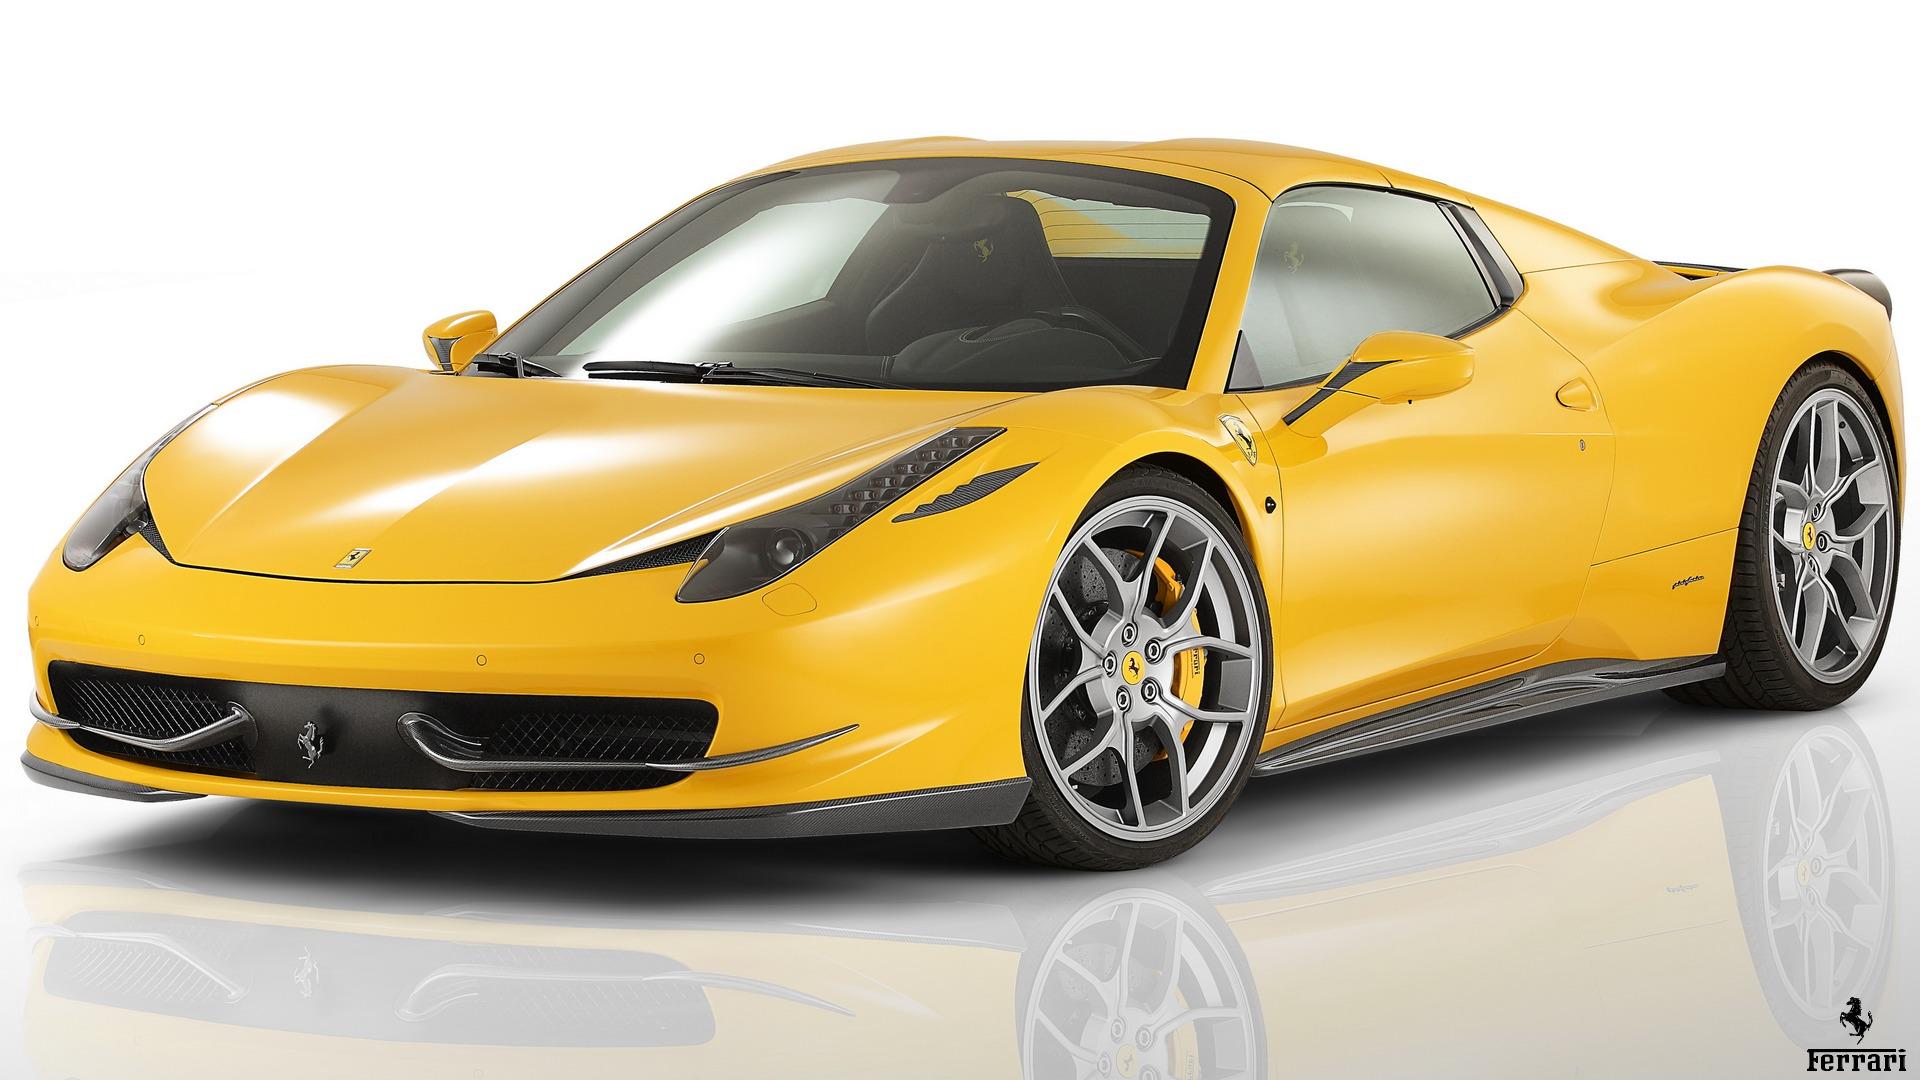 fonds d'écran ferrari gratuits : voitures de sport.